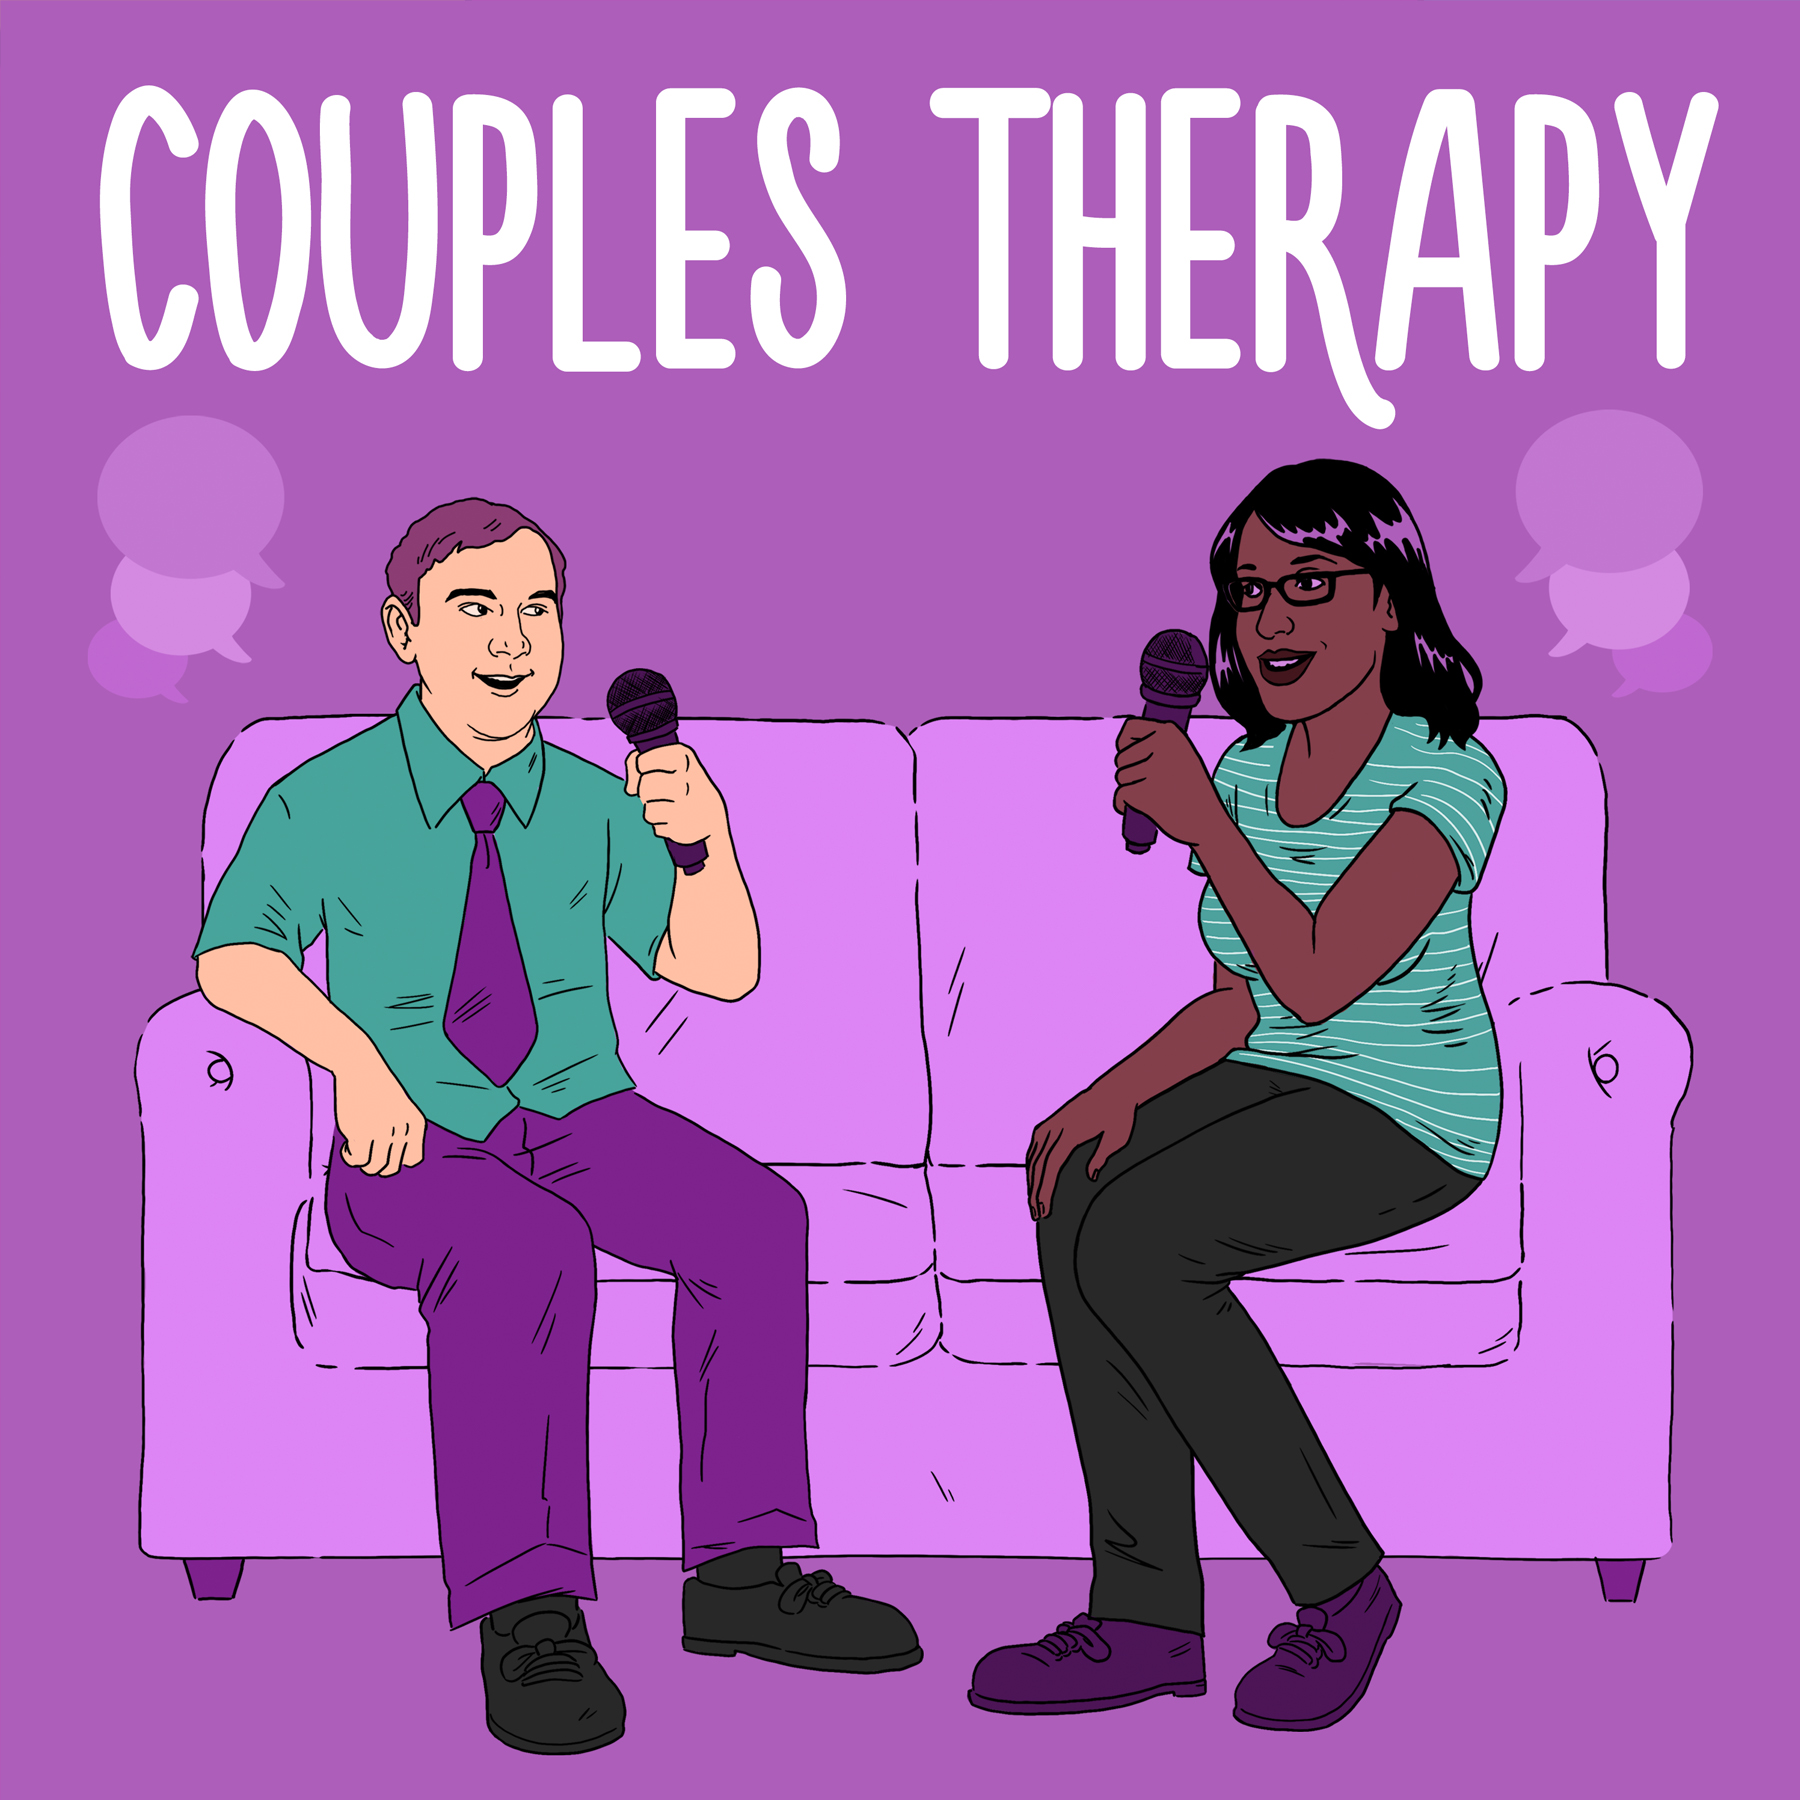 CouplesTherapy_Logo_CoreImage.jpg